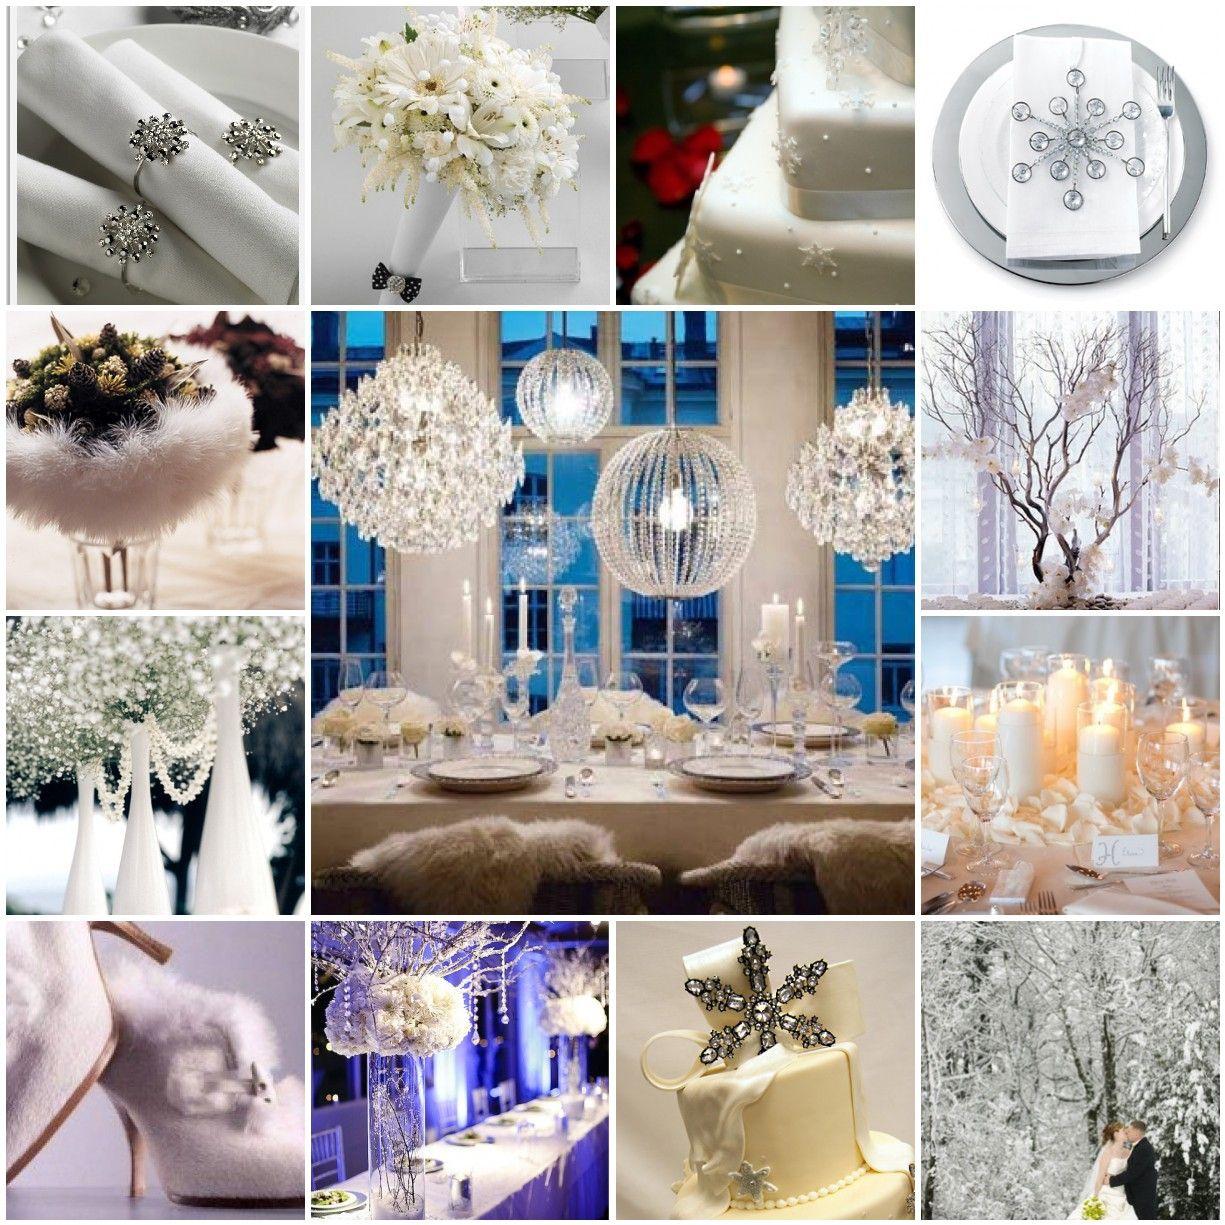 Wedding decoration ideas blue and white  Winter wedding idea  My fairytale  Pinterest  Winter wedding